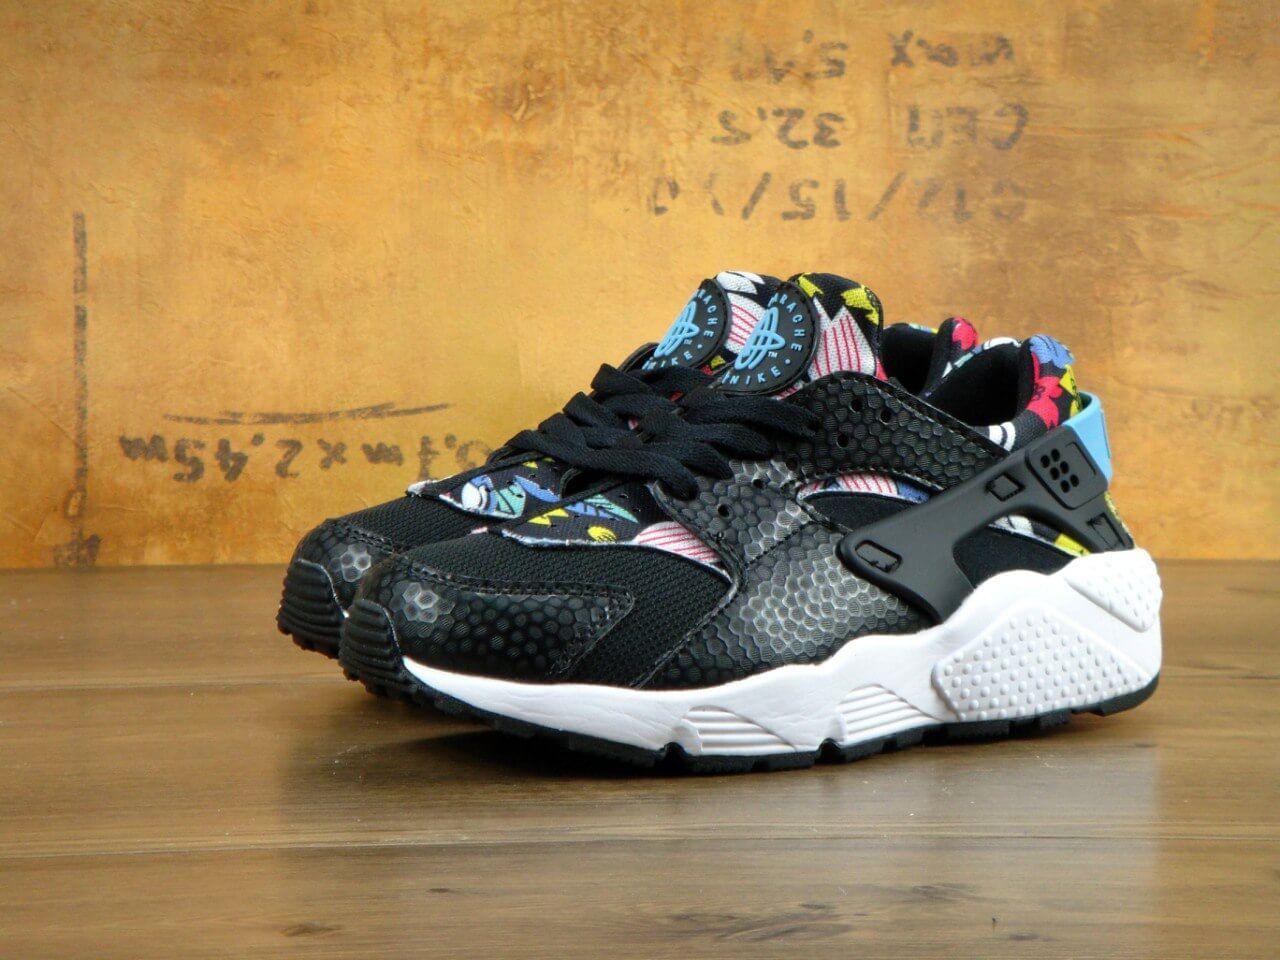 Женские кроссовки Nike Huarache Black Flower Black White (Кроссовки Найк Хуараче черно-белые)